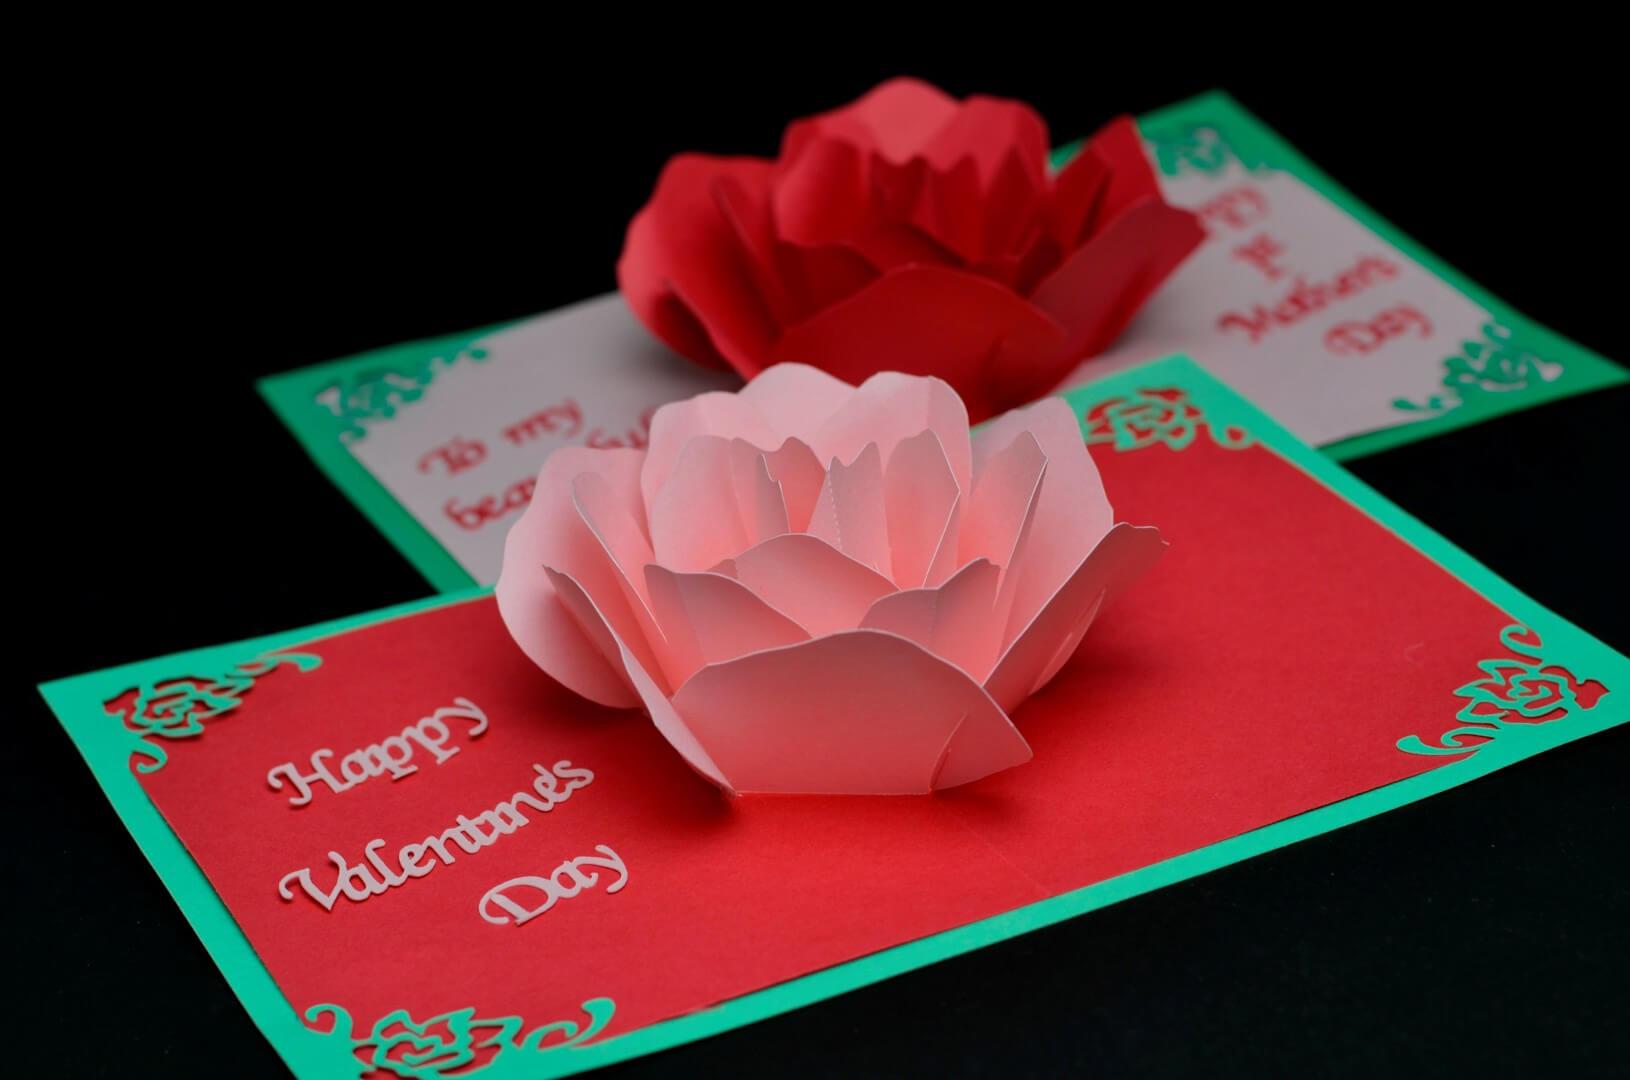 Rose Flower Pop Up Card Template Regarding Templates For Pop Up Cards Free